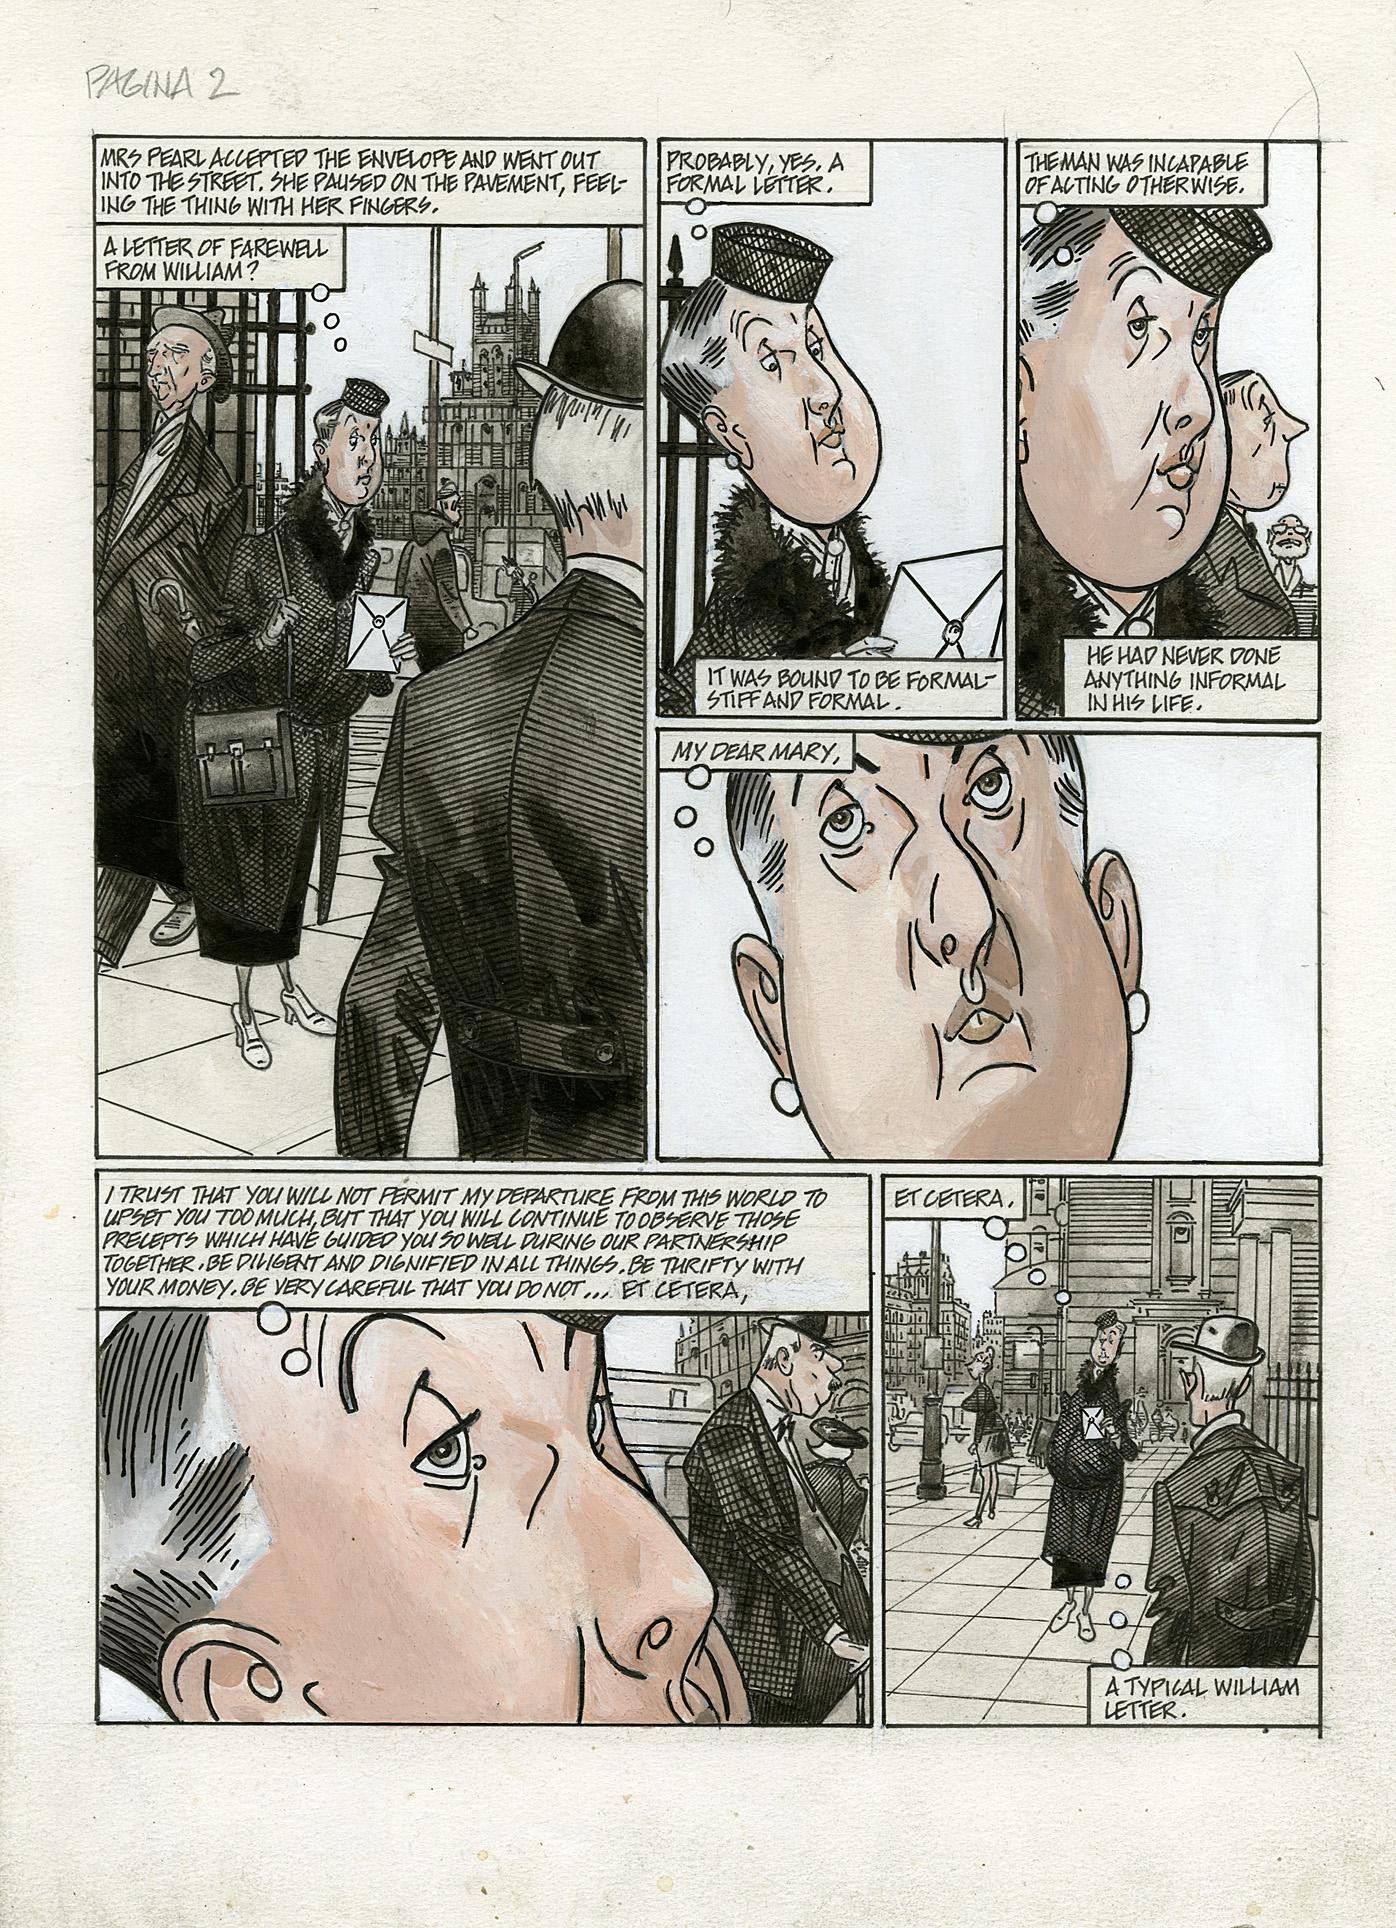 Dick Matena James Joyce Ulysses 2